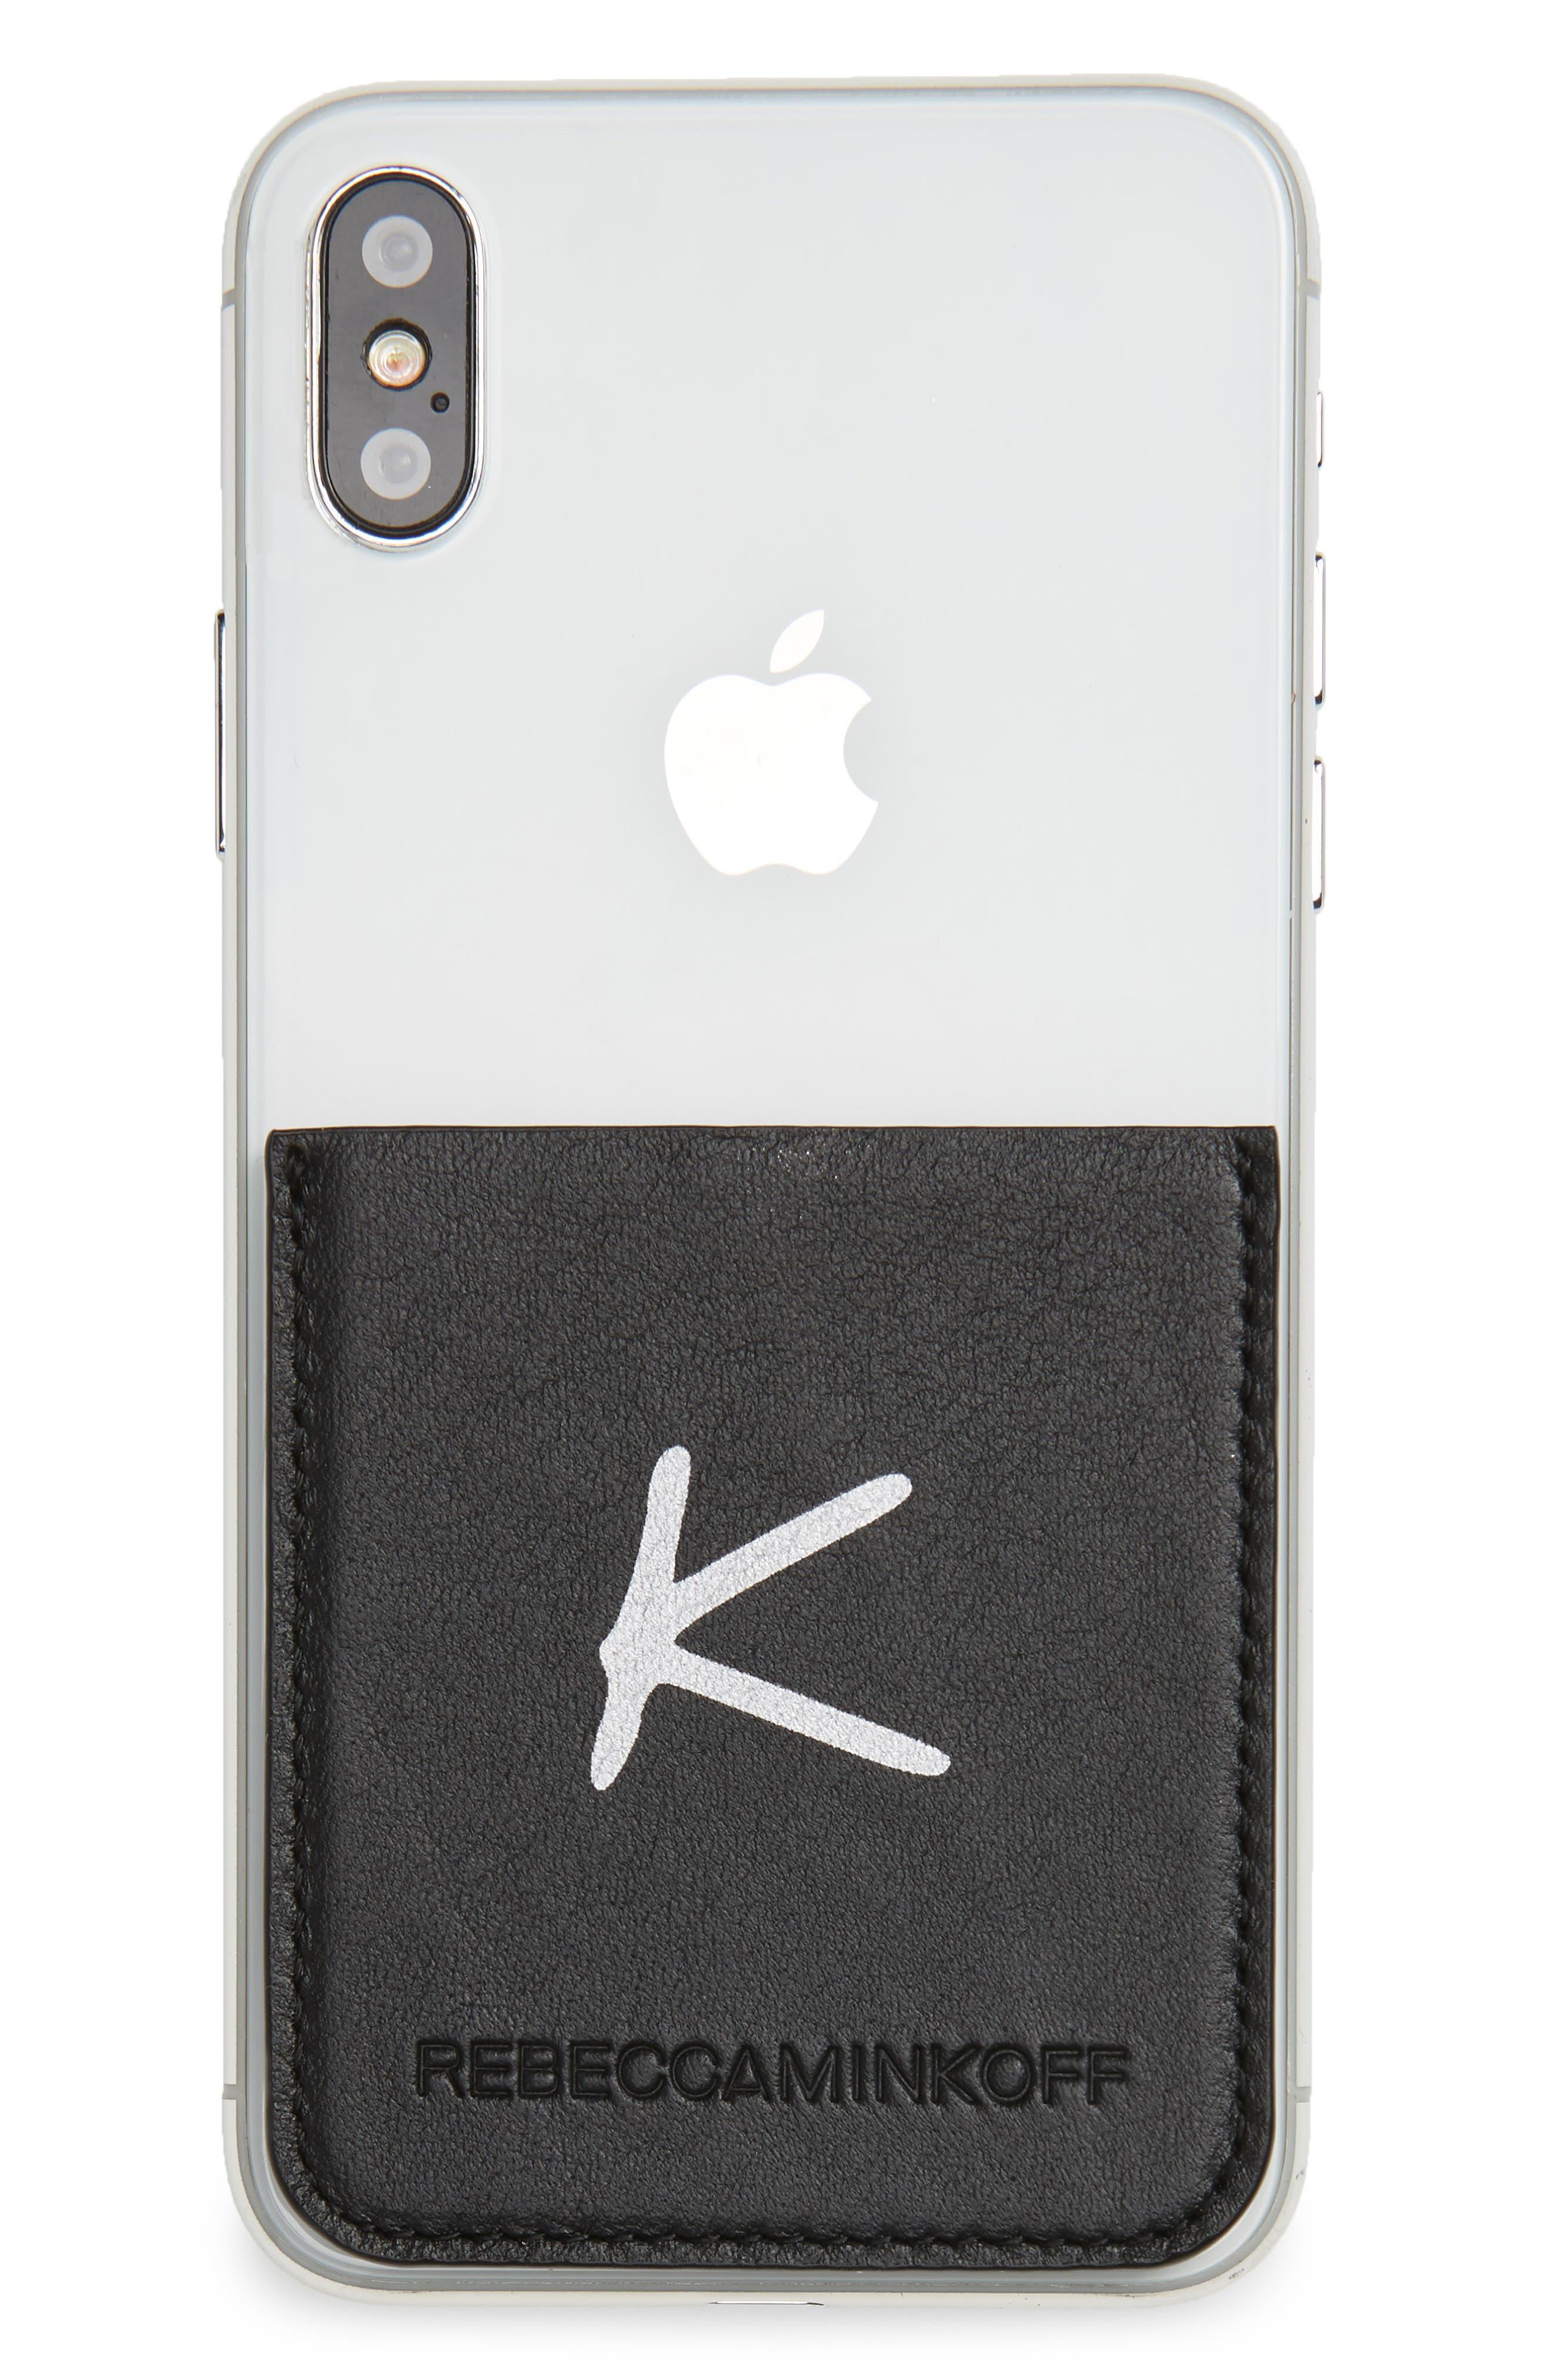 Initial Smartphone Sticker Pocket,                             Alternate thumbnail 2, color,